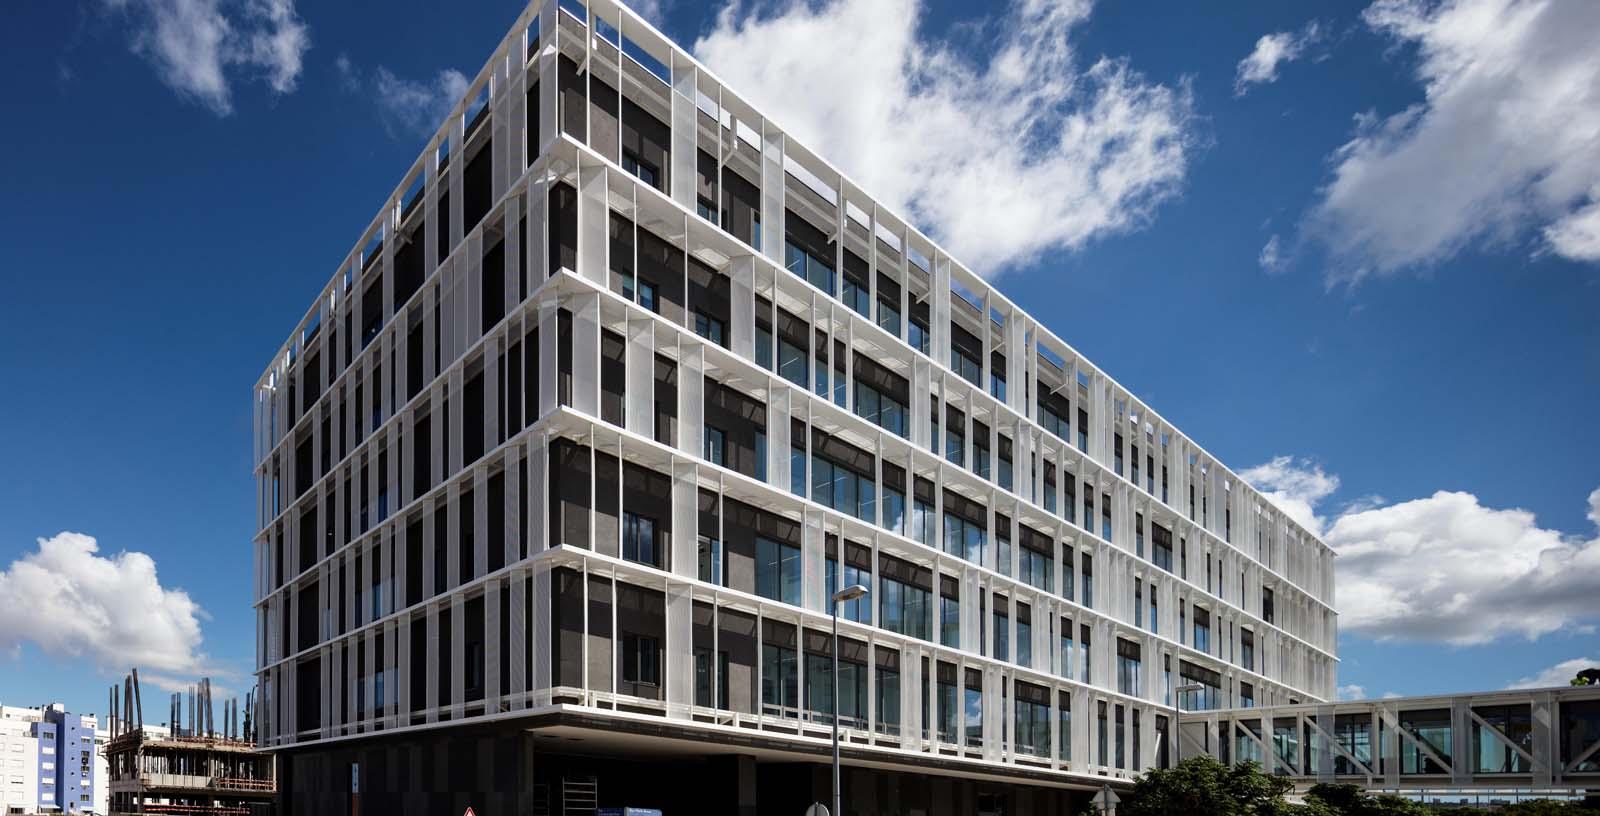 Cuf-Descobertas-Hospital_Architecture_01_IDOM_copyright_Fernando-Guerra